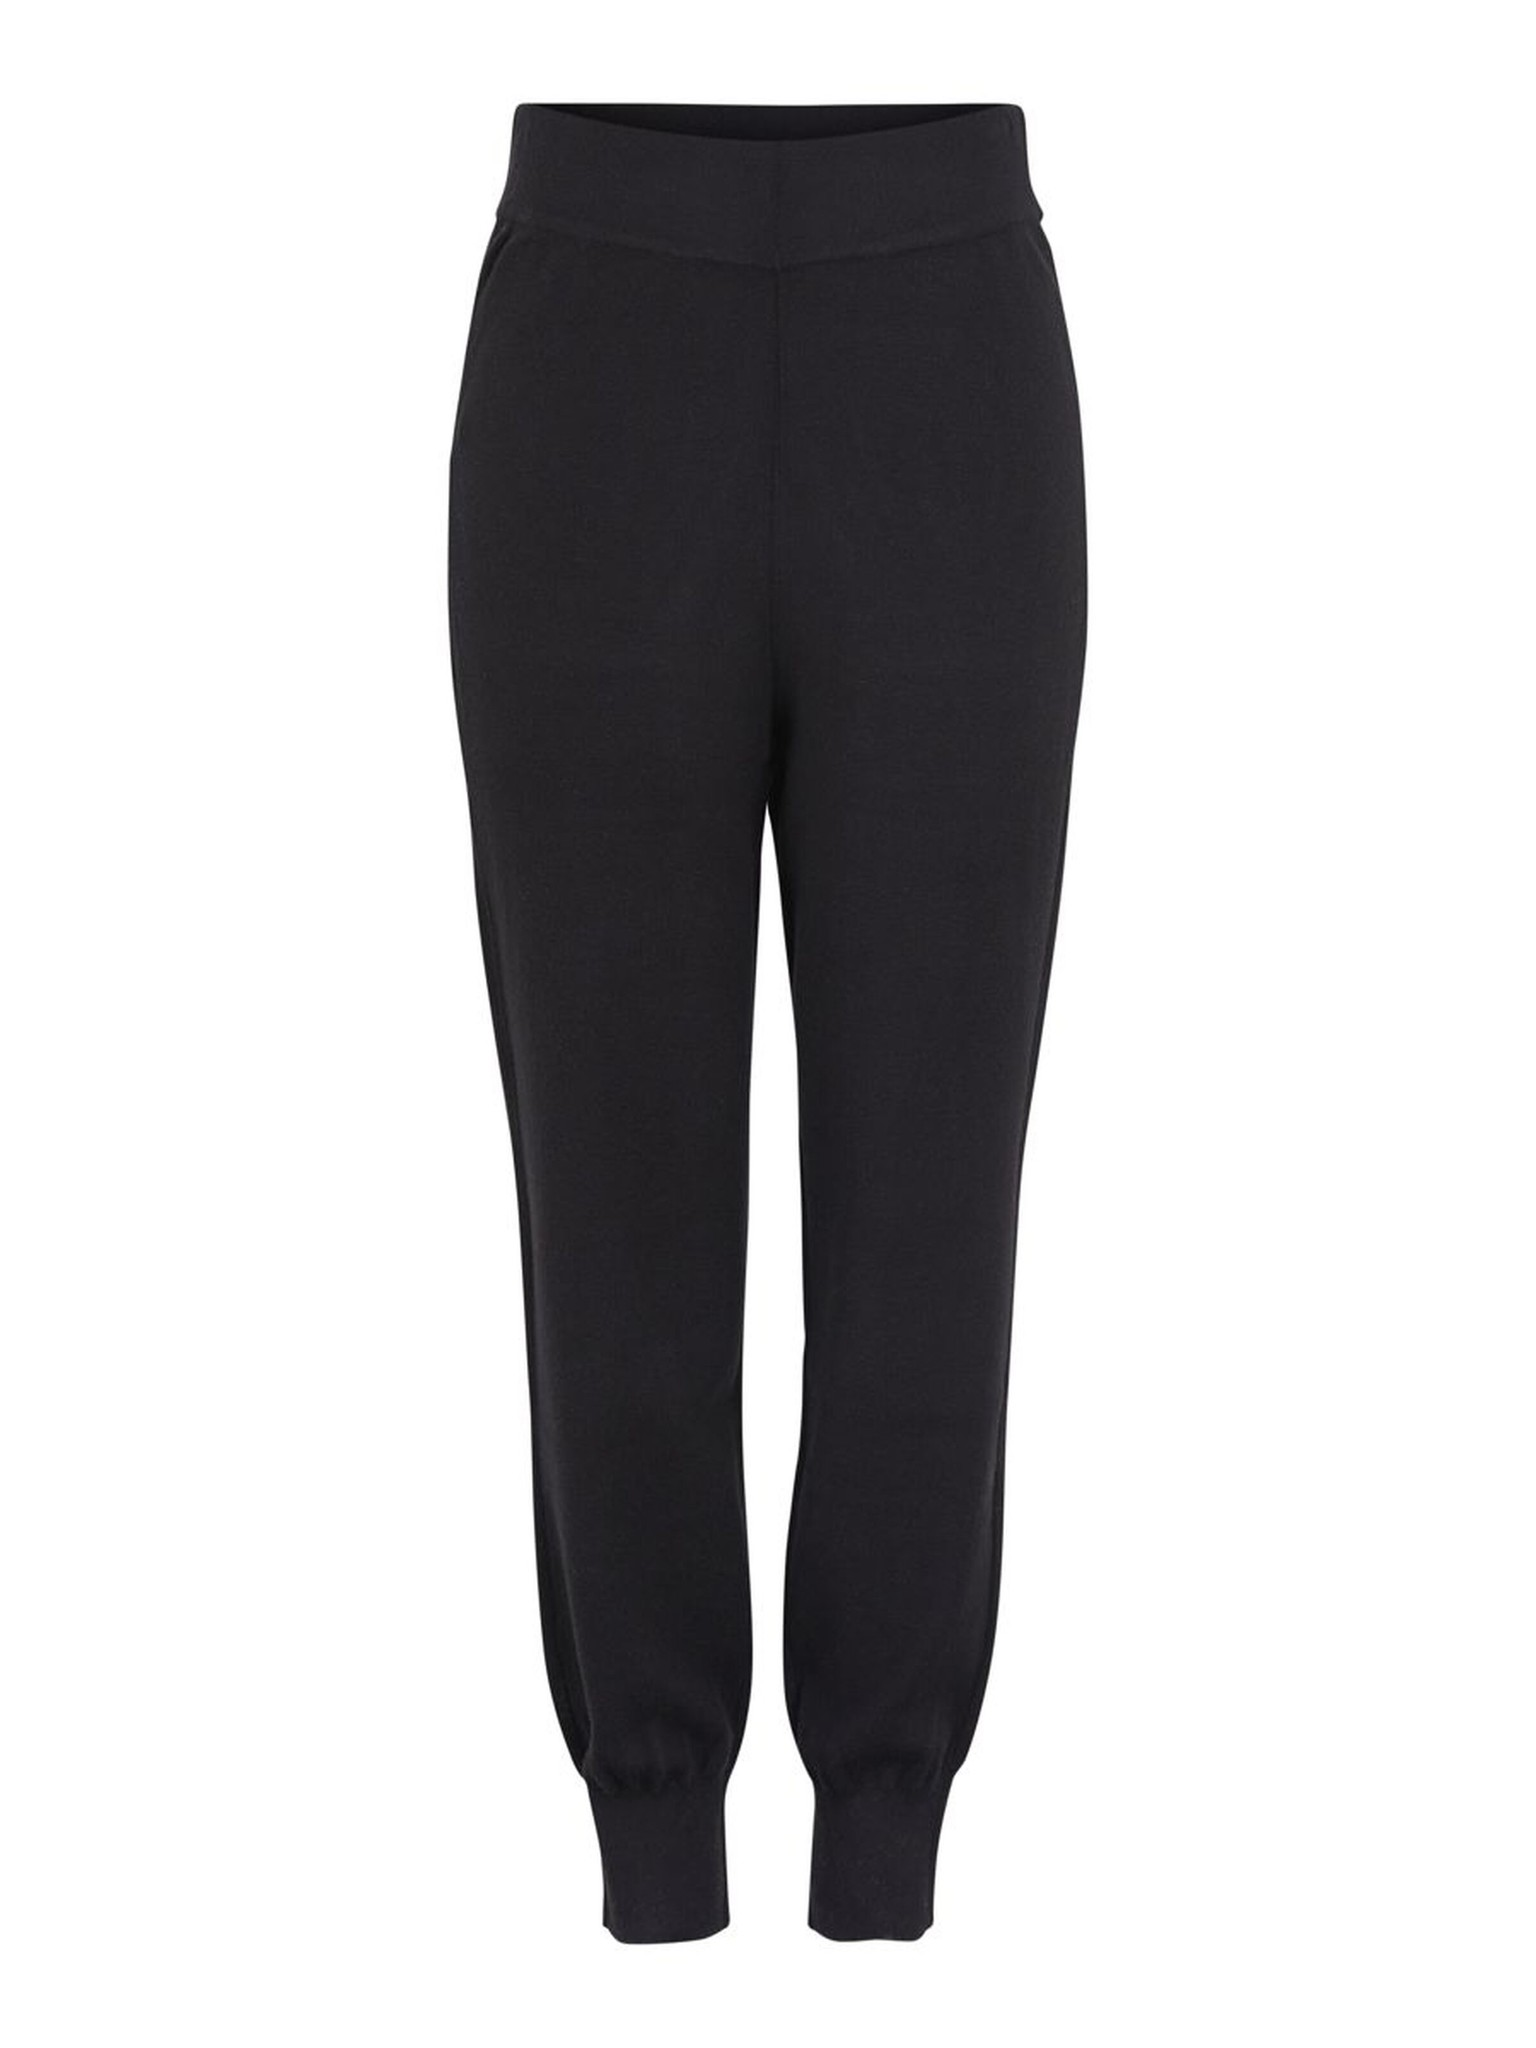 Broek Yasfonny knit pants black-1